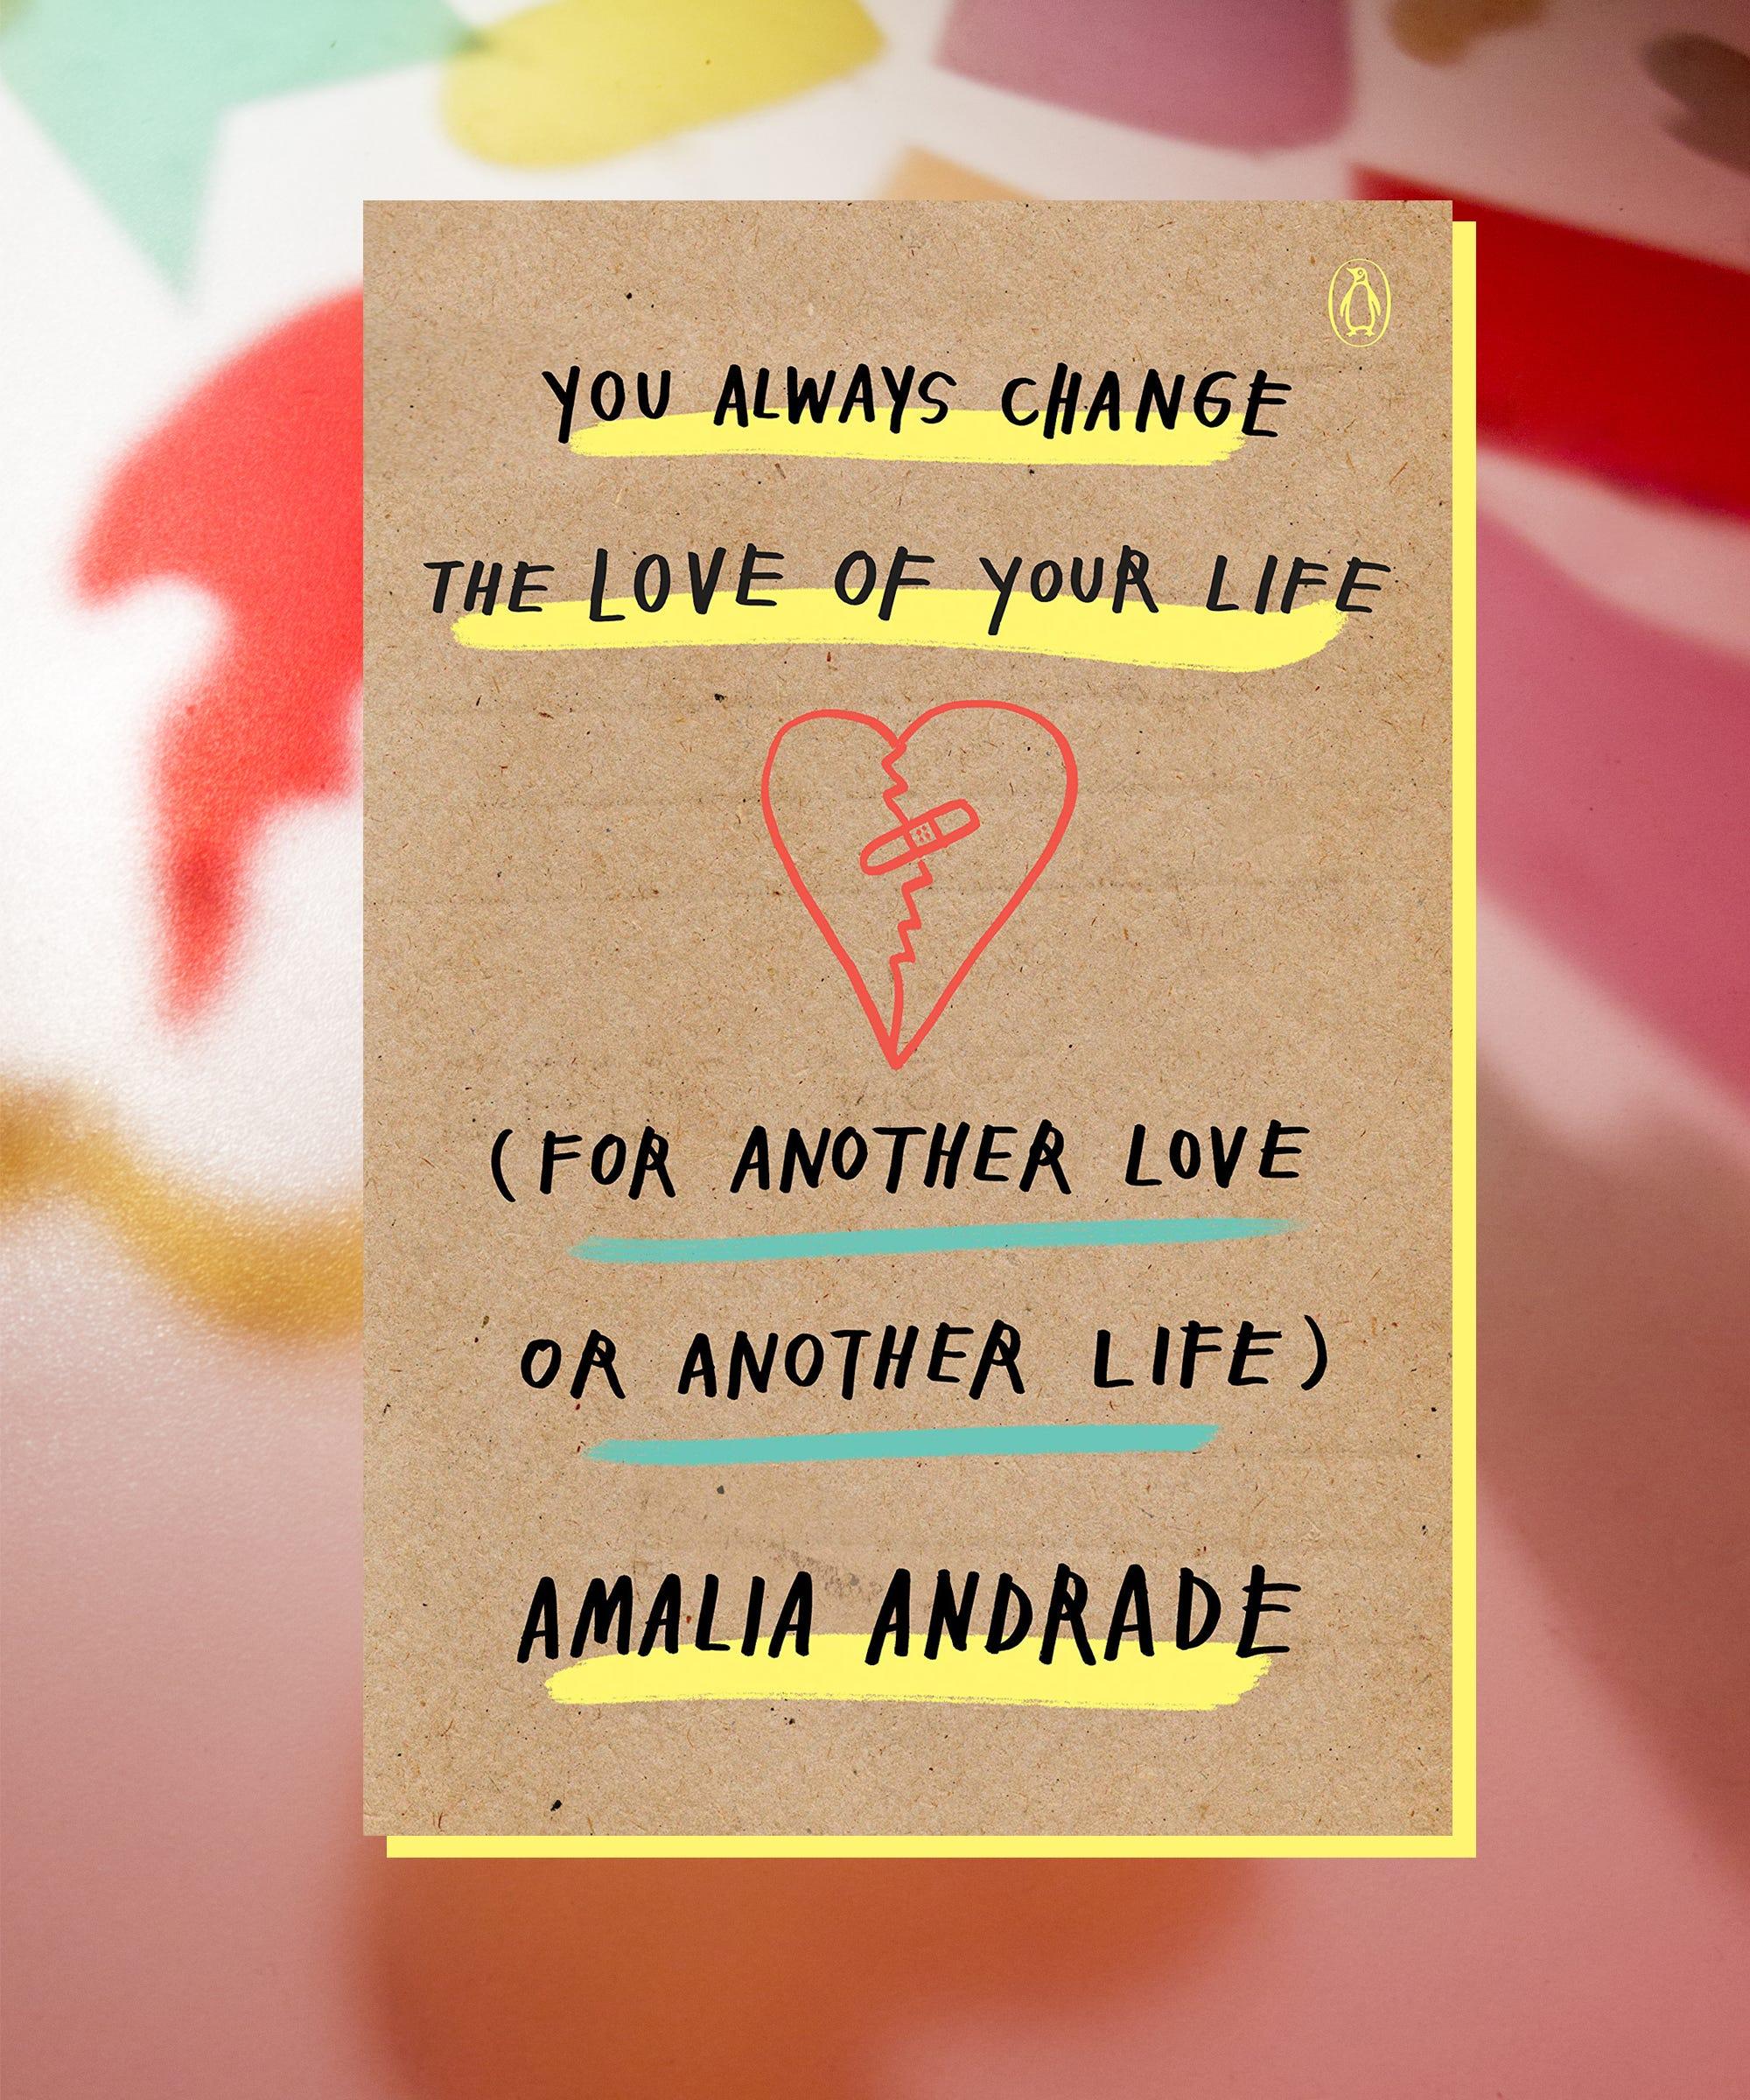 best breakup books about